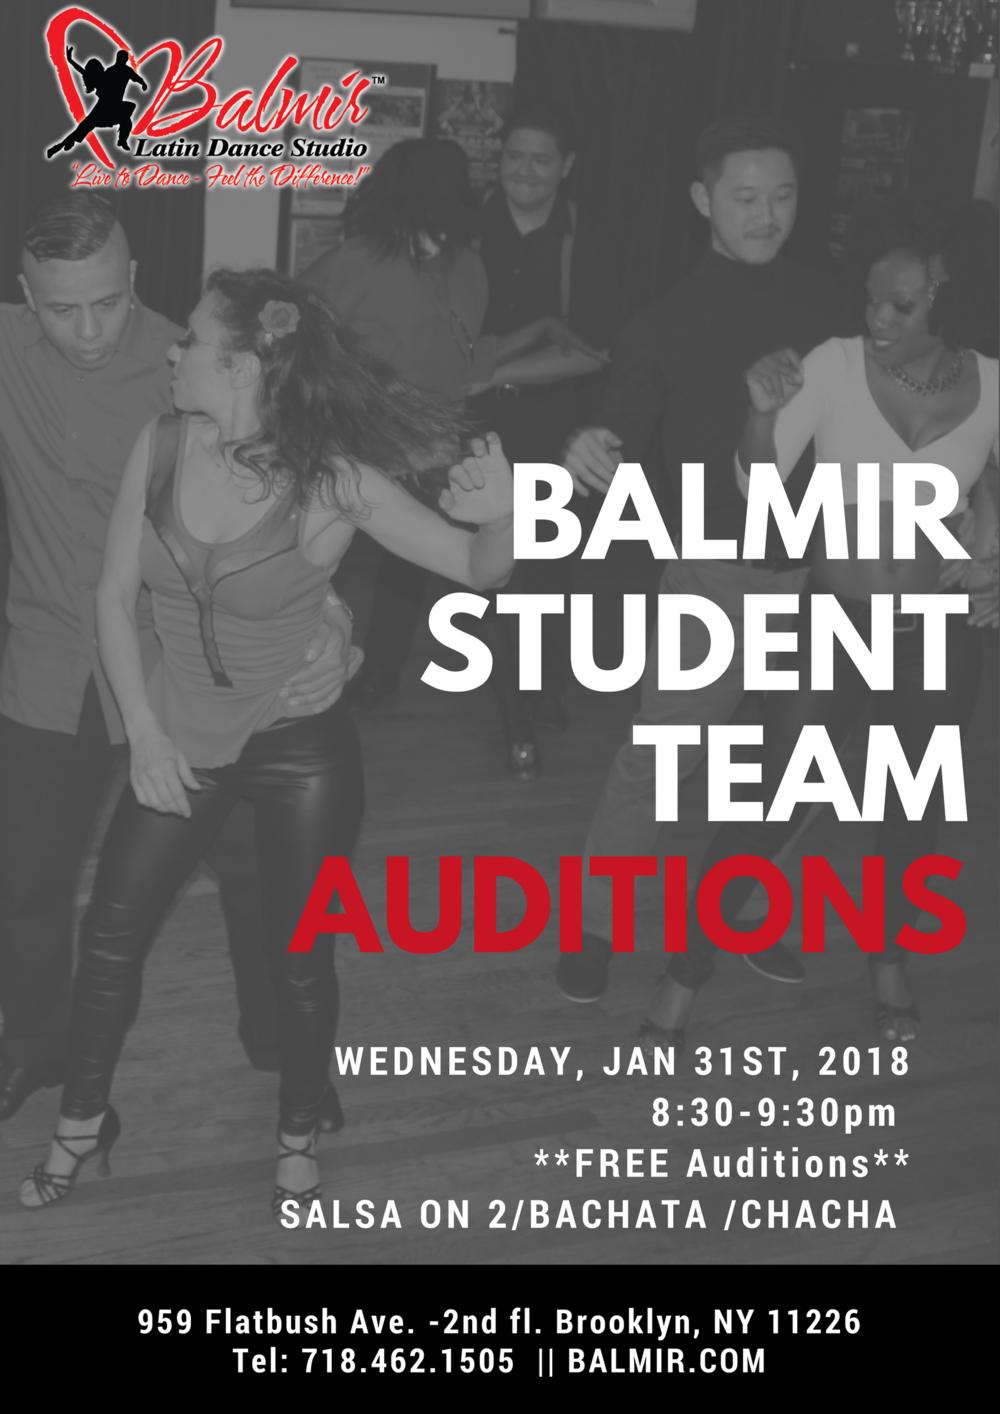 balmir student team auditions January 2018